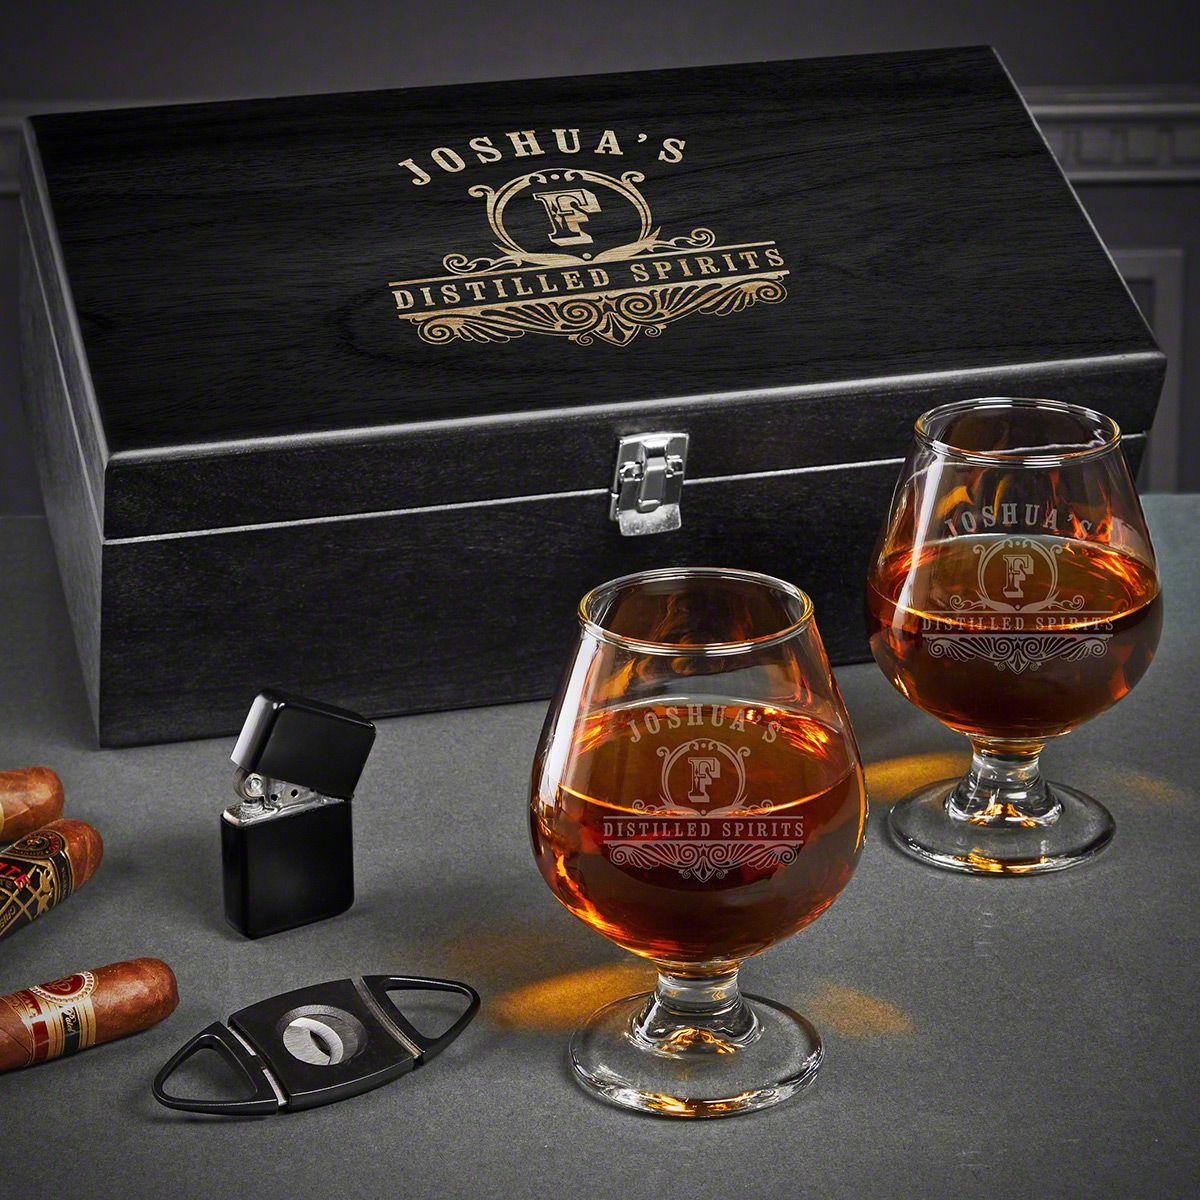 Carraway Engraved Cognac Gift Set